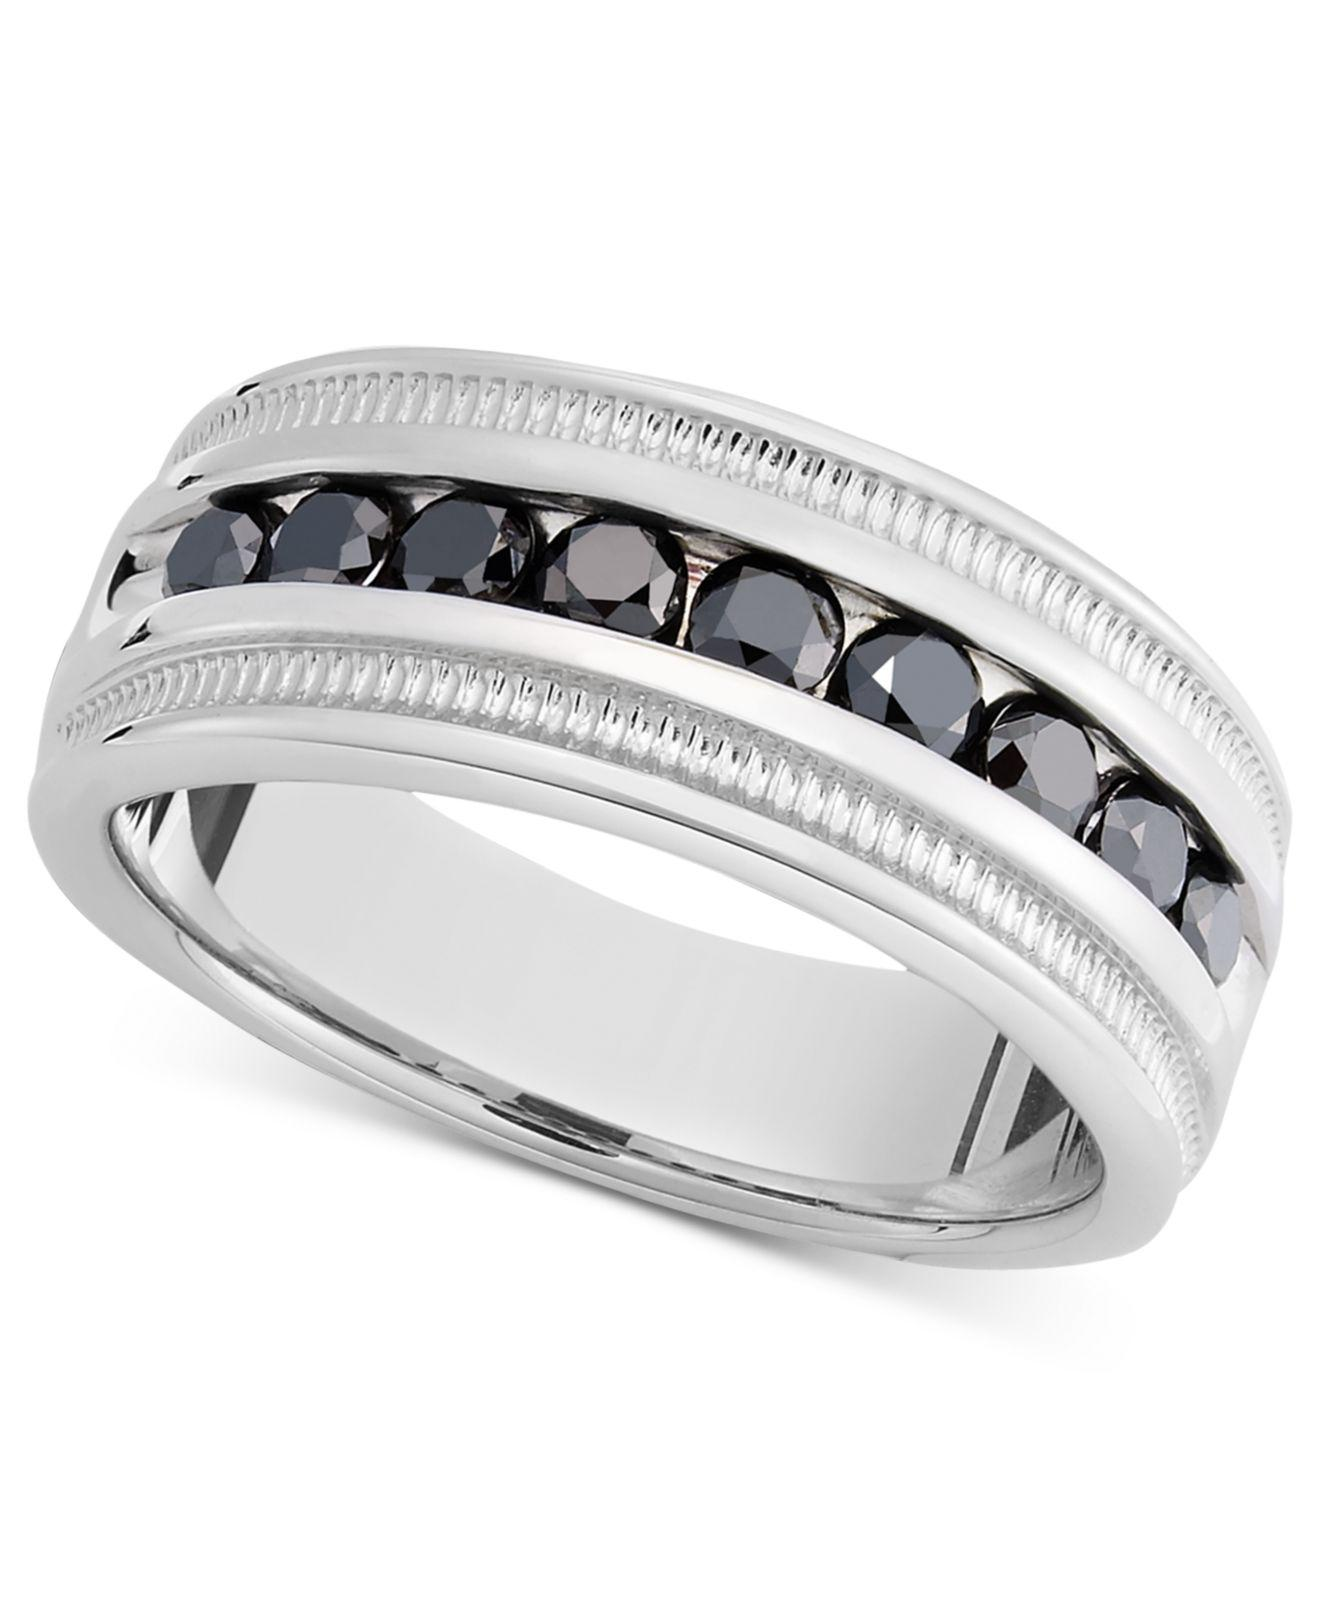 59f8b3879 Macy's Metallic Men's Sterling Silver Ring, Black Diamond Band (1 Ct.  T.w.). View fullscreen